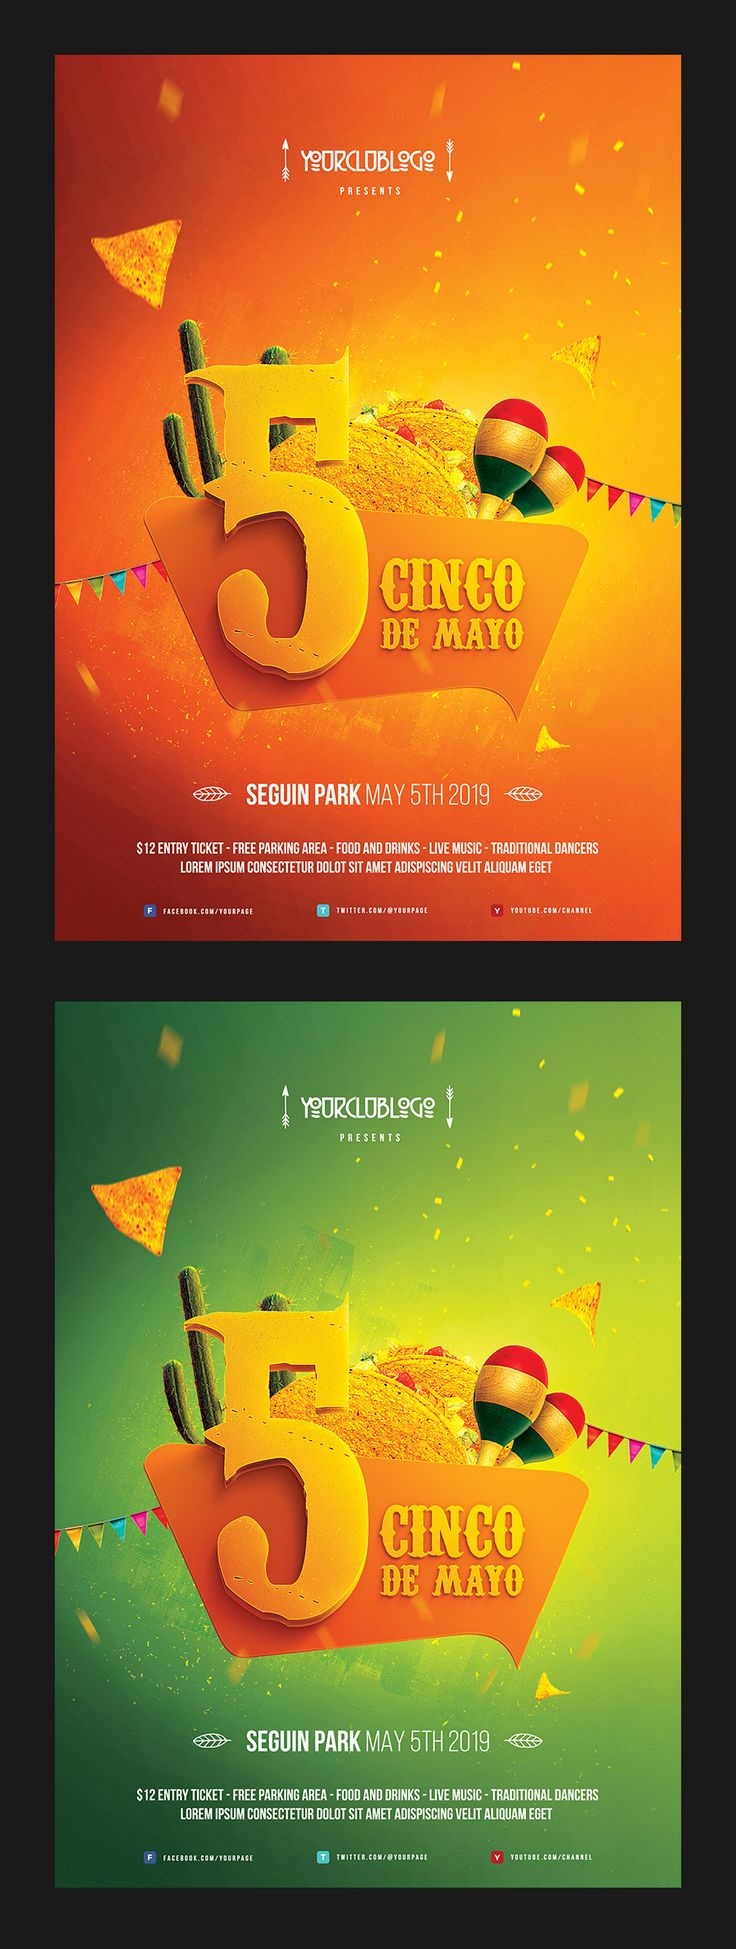 Cinco de Mayo Flyer Template on Behance